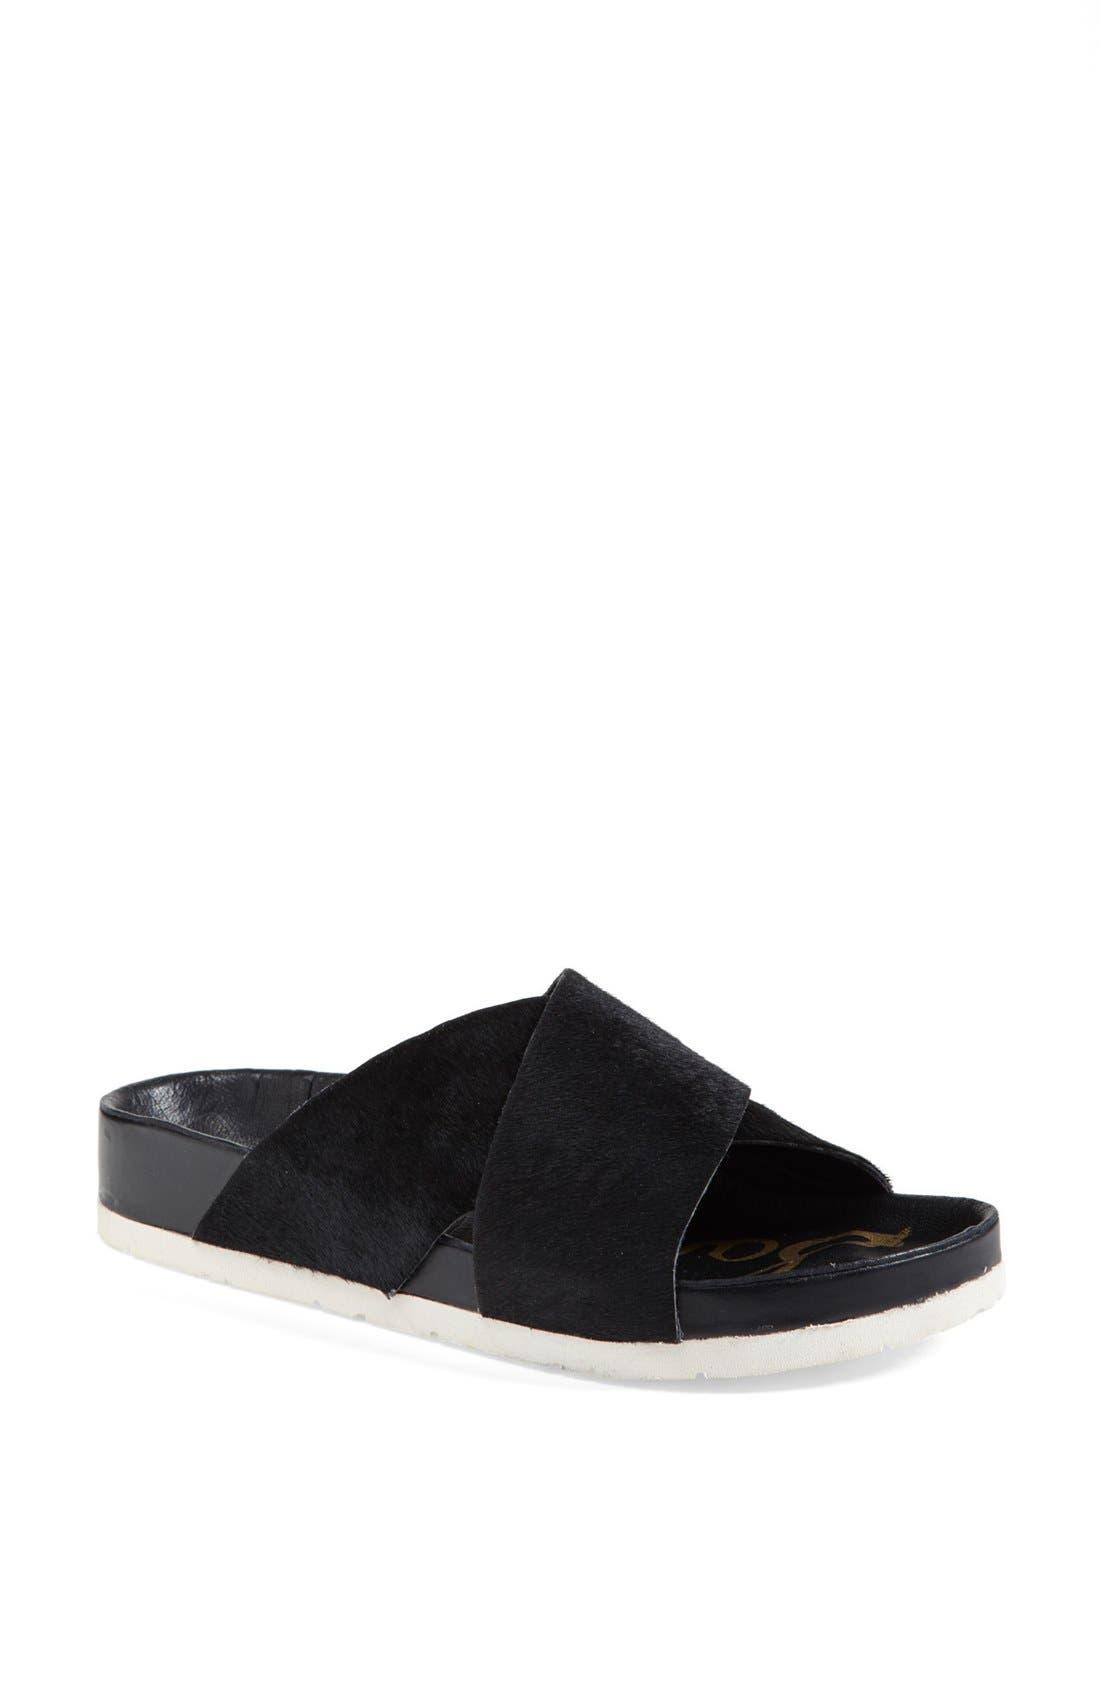 'Adora' Sandal,                         Main,                         color,